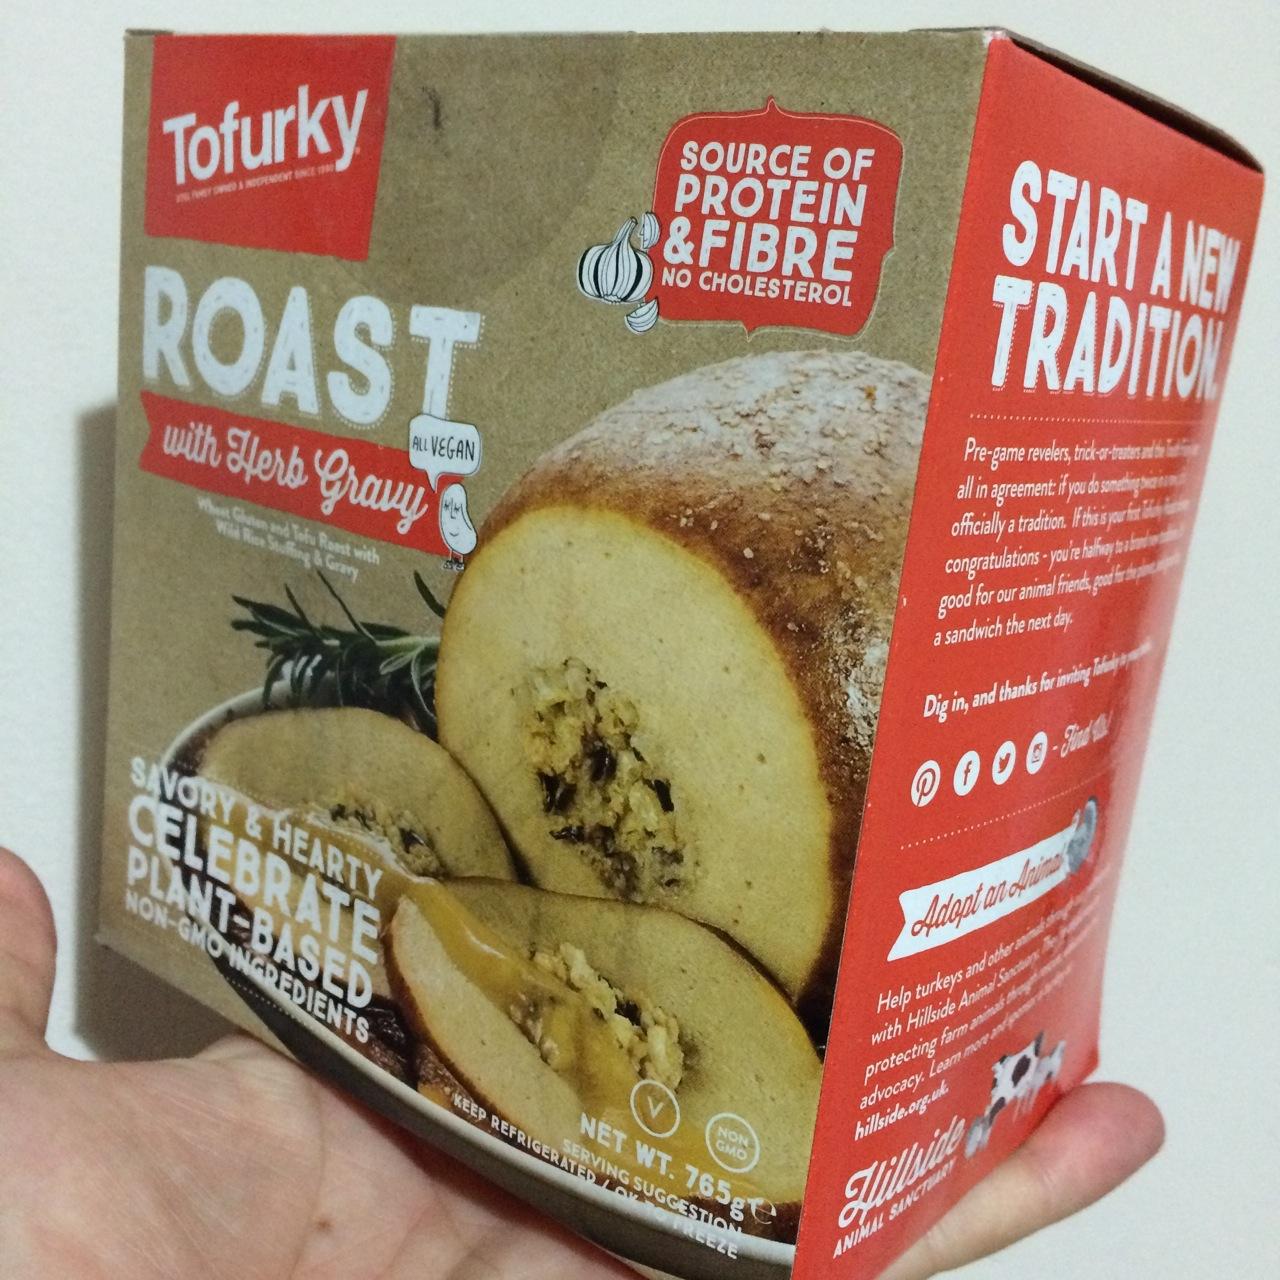 https://i2.wp.com/fatgayvegan.com/wp-content/uploads/2015/11/Tofurky-Roast-with-Herb-Gravy.jpg?fit=1280%2C1280&ssl=1